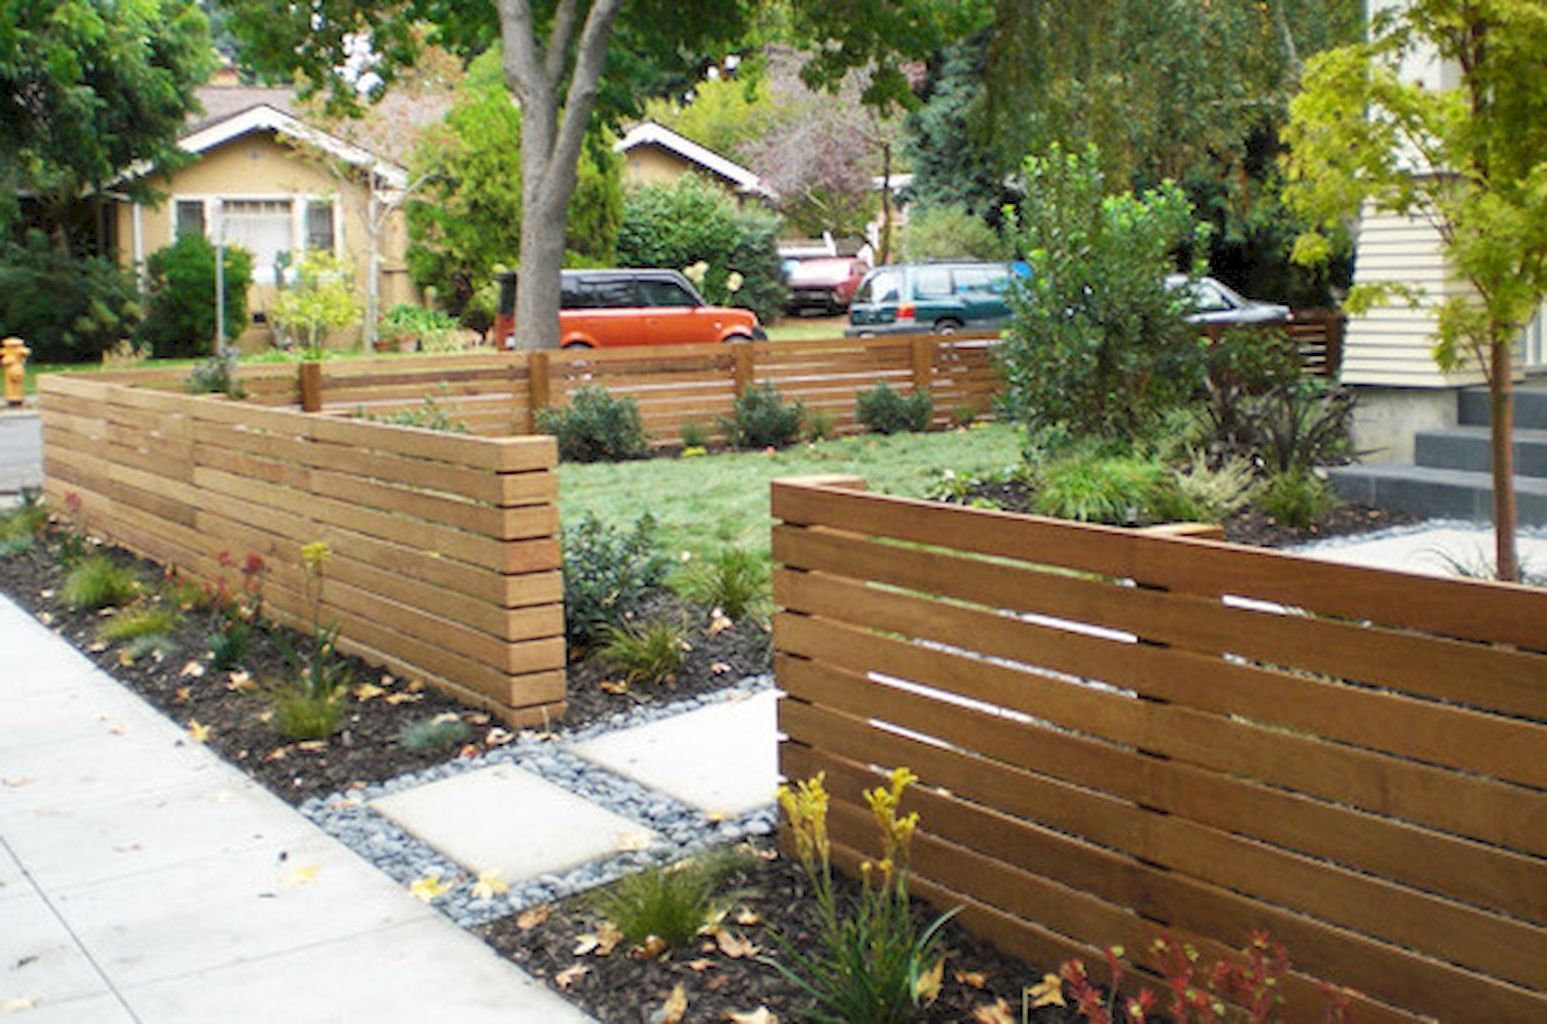 Modern Front Yard See Through Fence Modern Front Yard Front Yard Front Yard Landscaping Modern front garden fence ideas